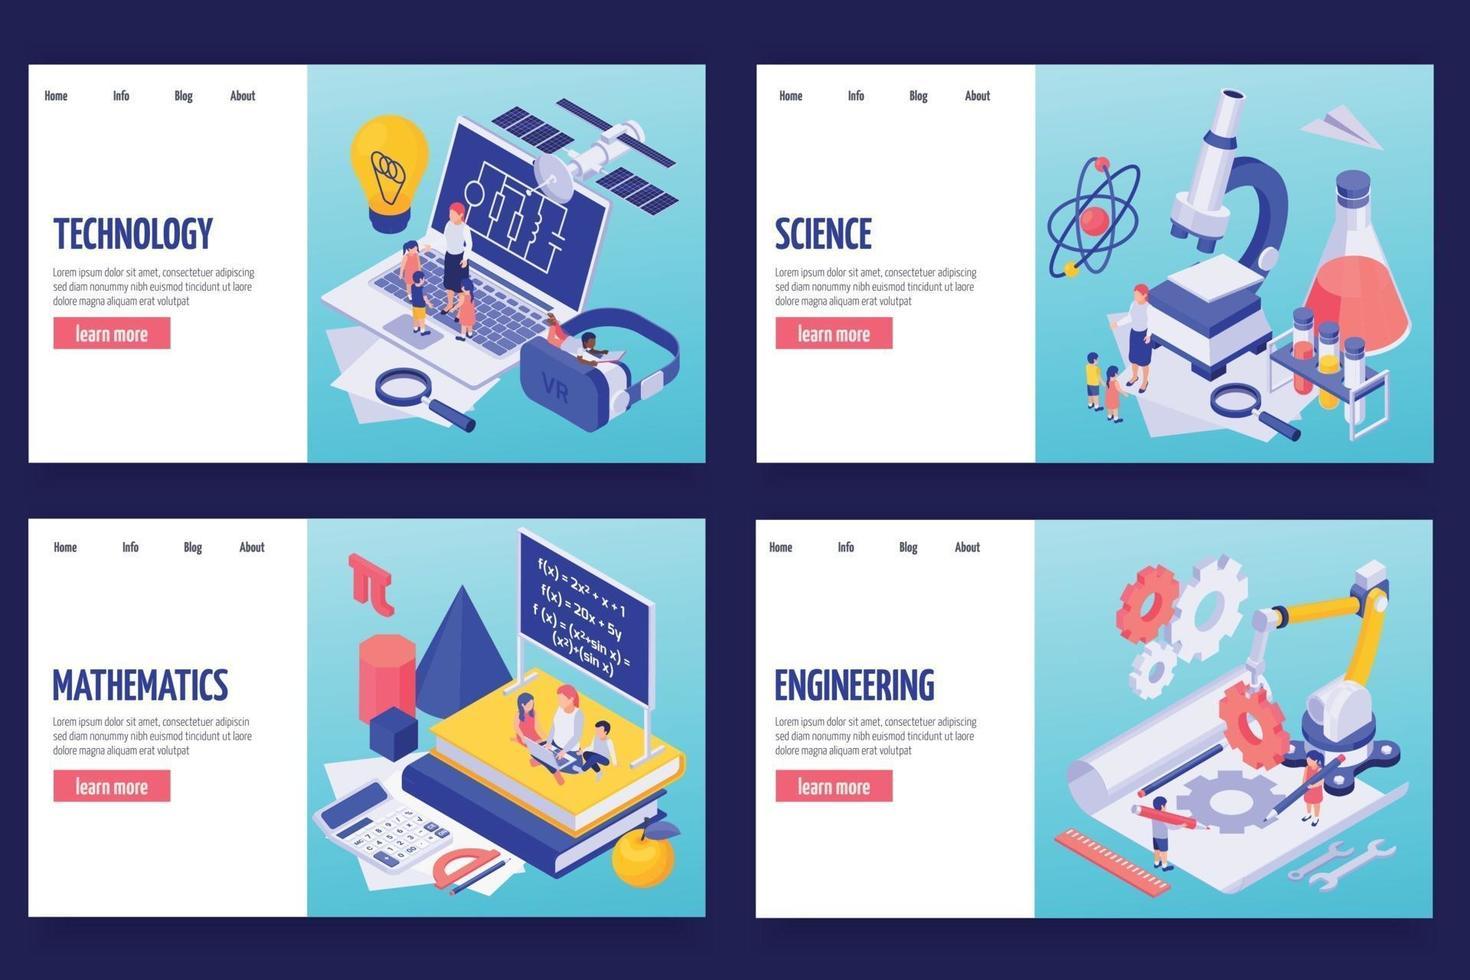 STEM Education Horizontal Banners vector